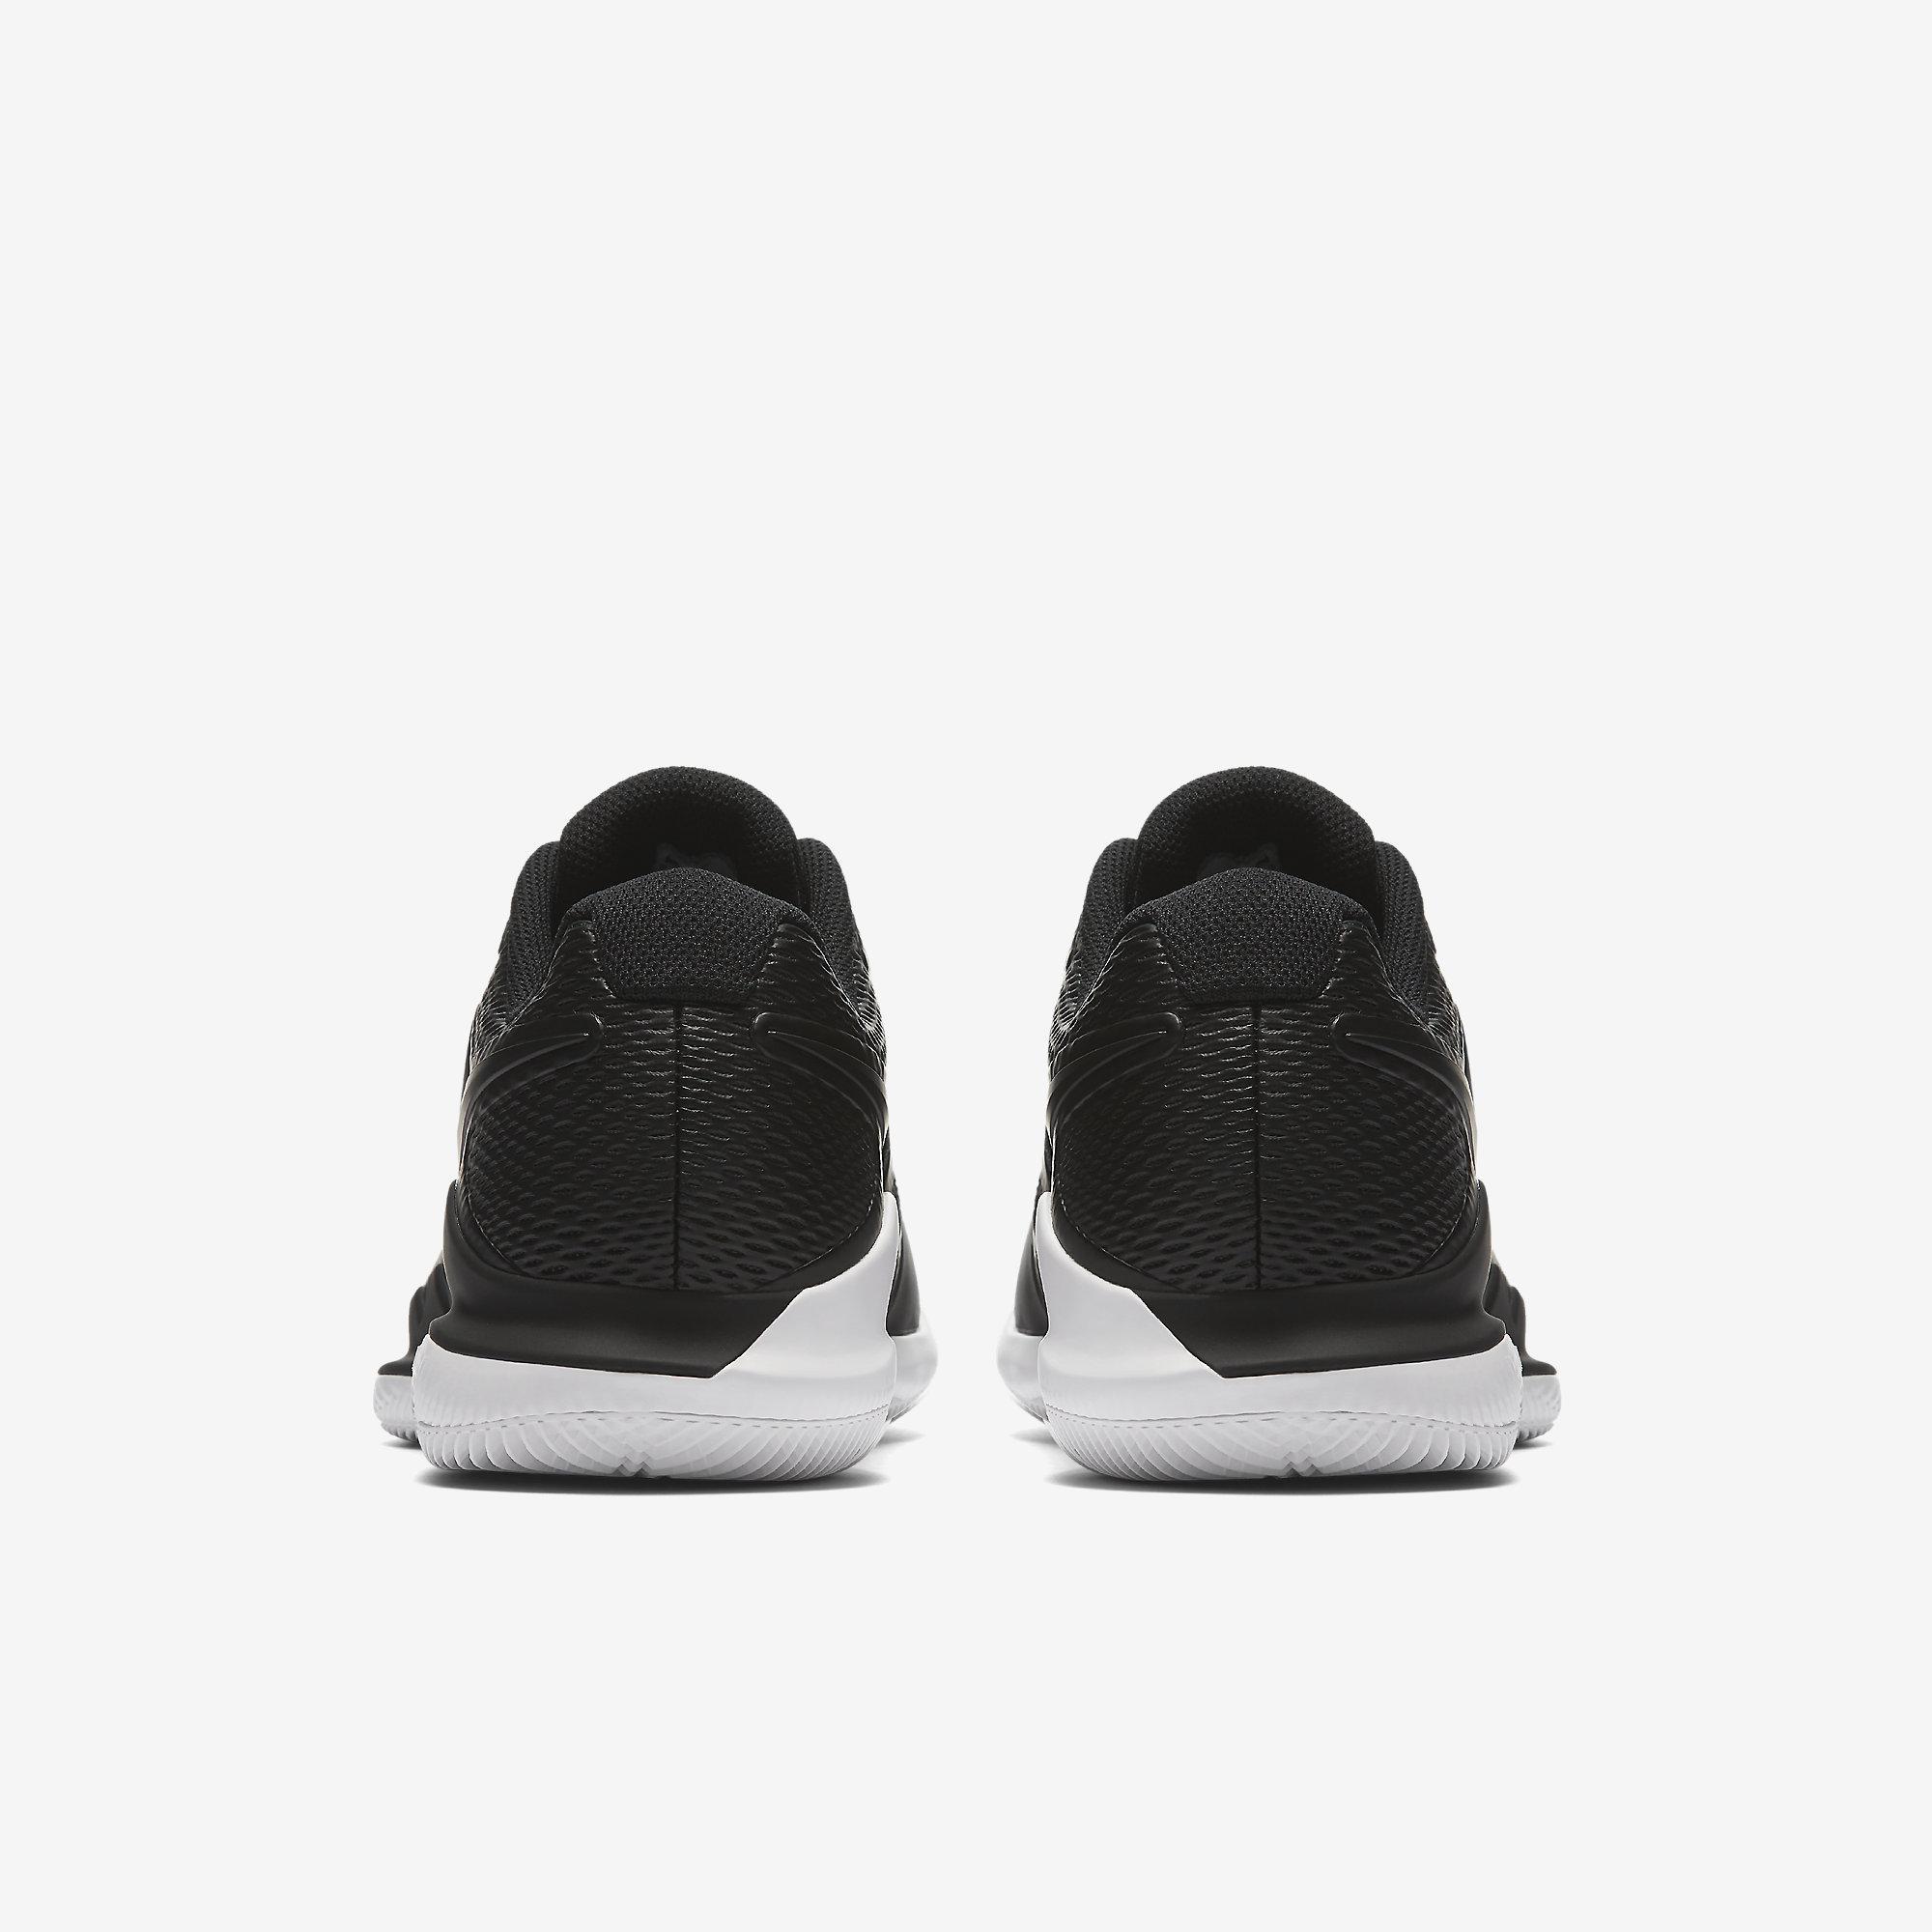 the latest 7eb09 e48fb Nike Mens Air Zoom Vapor X Tennis Shoes - Black White